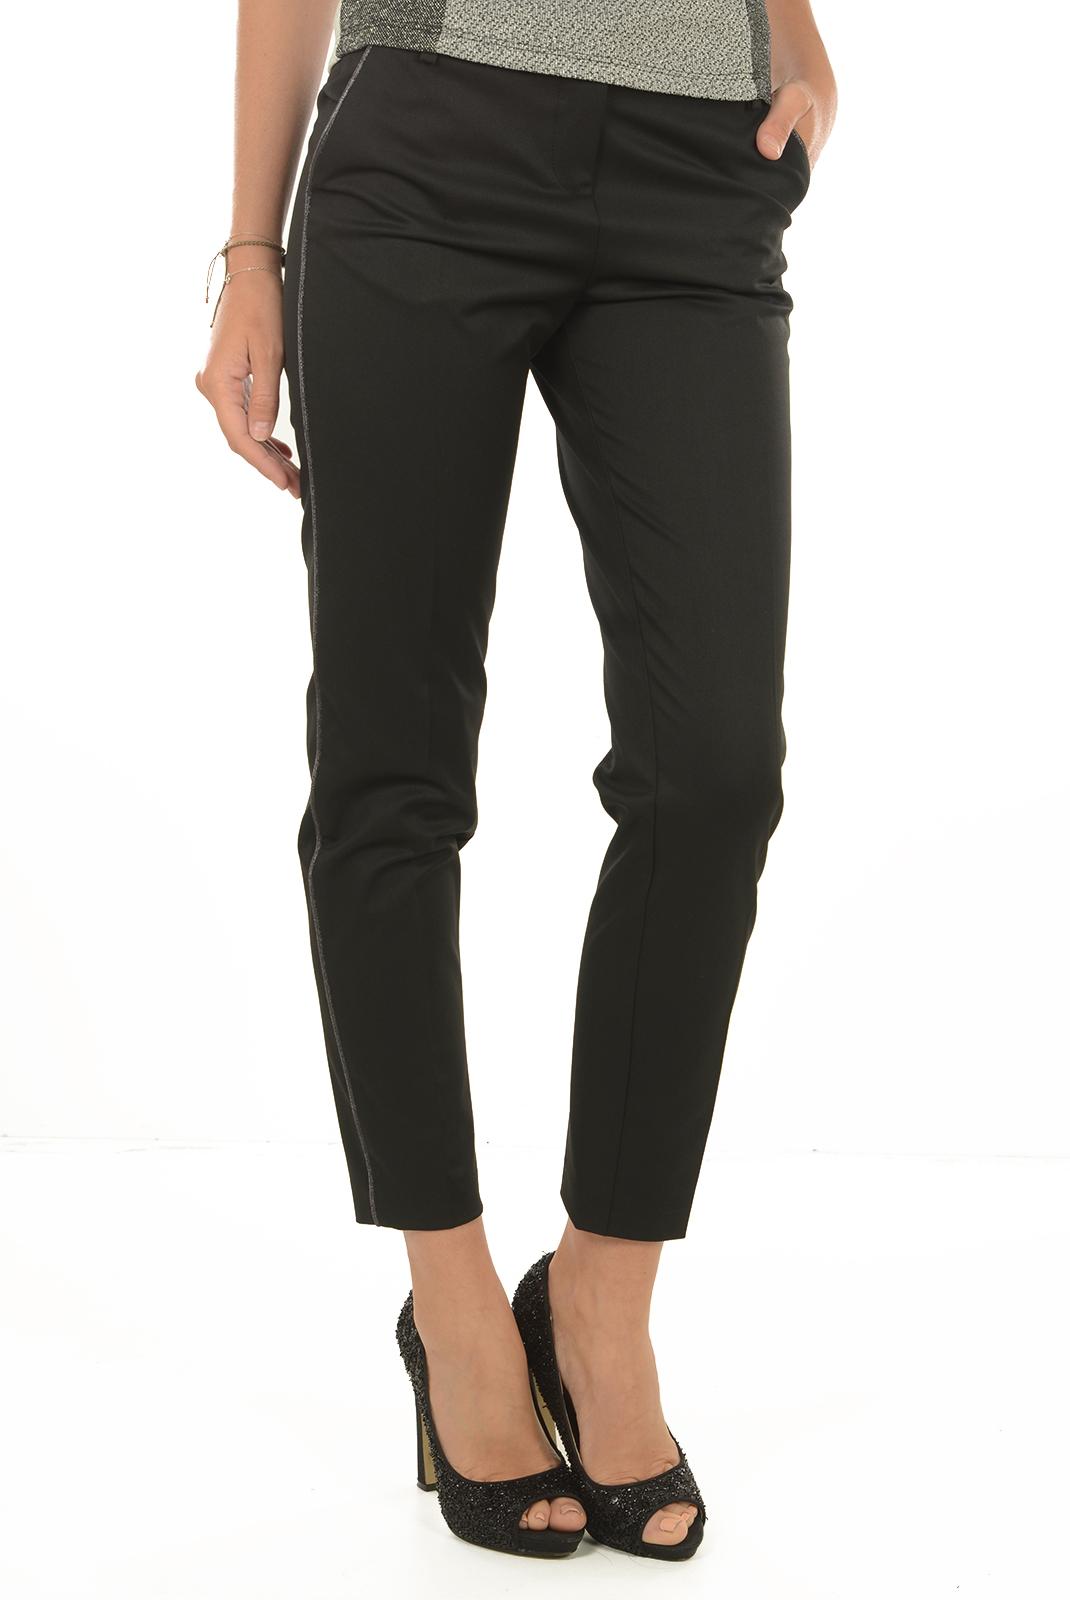 Pantalons  Morgan 171-PCOCO NOIR